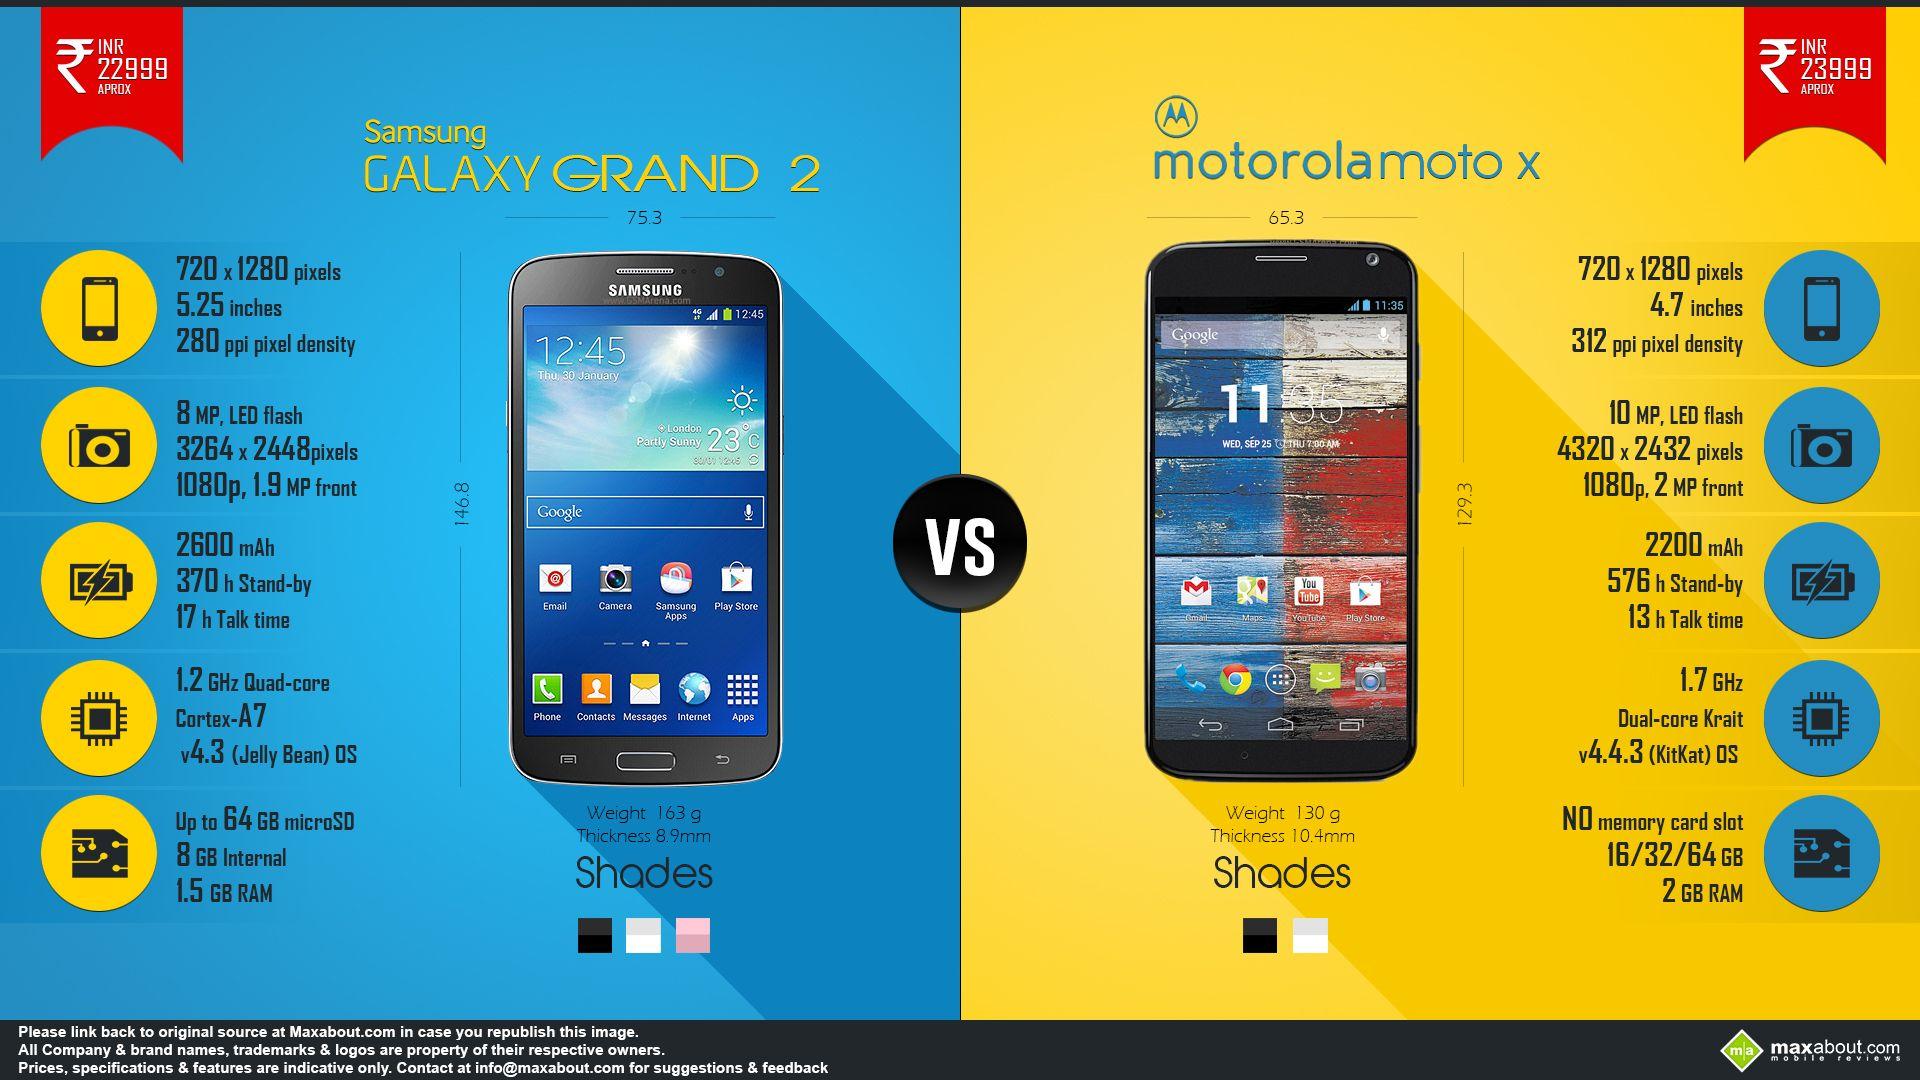 2 Samsung Galaxy Grand Wallpaper - WallpaperSafari